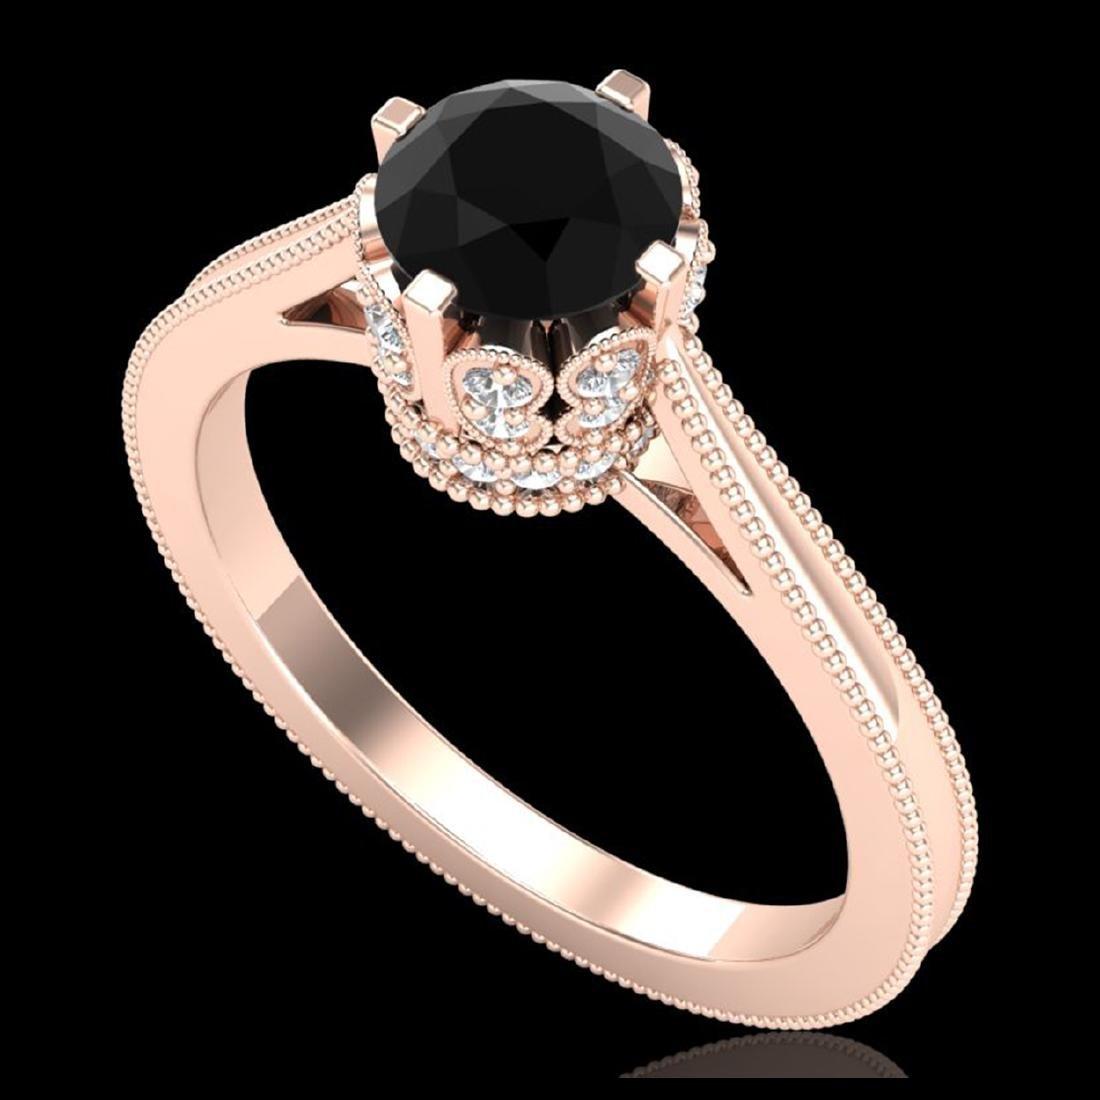 1.14 ctw Fancy Black Diamond Art Deco Ring 18K Rose